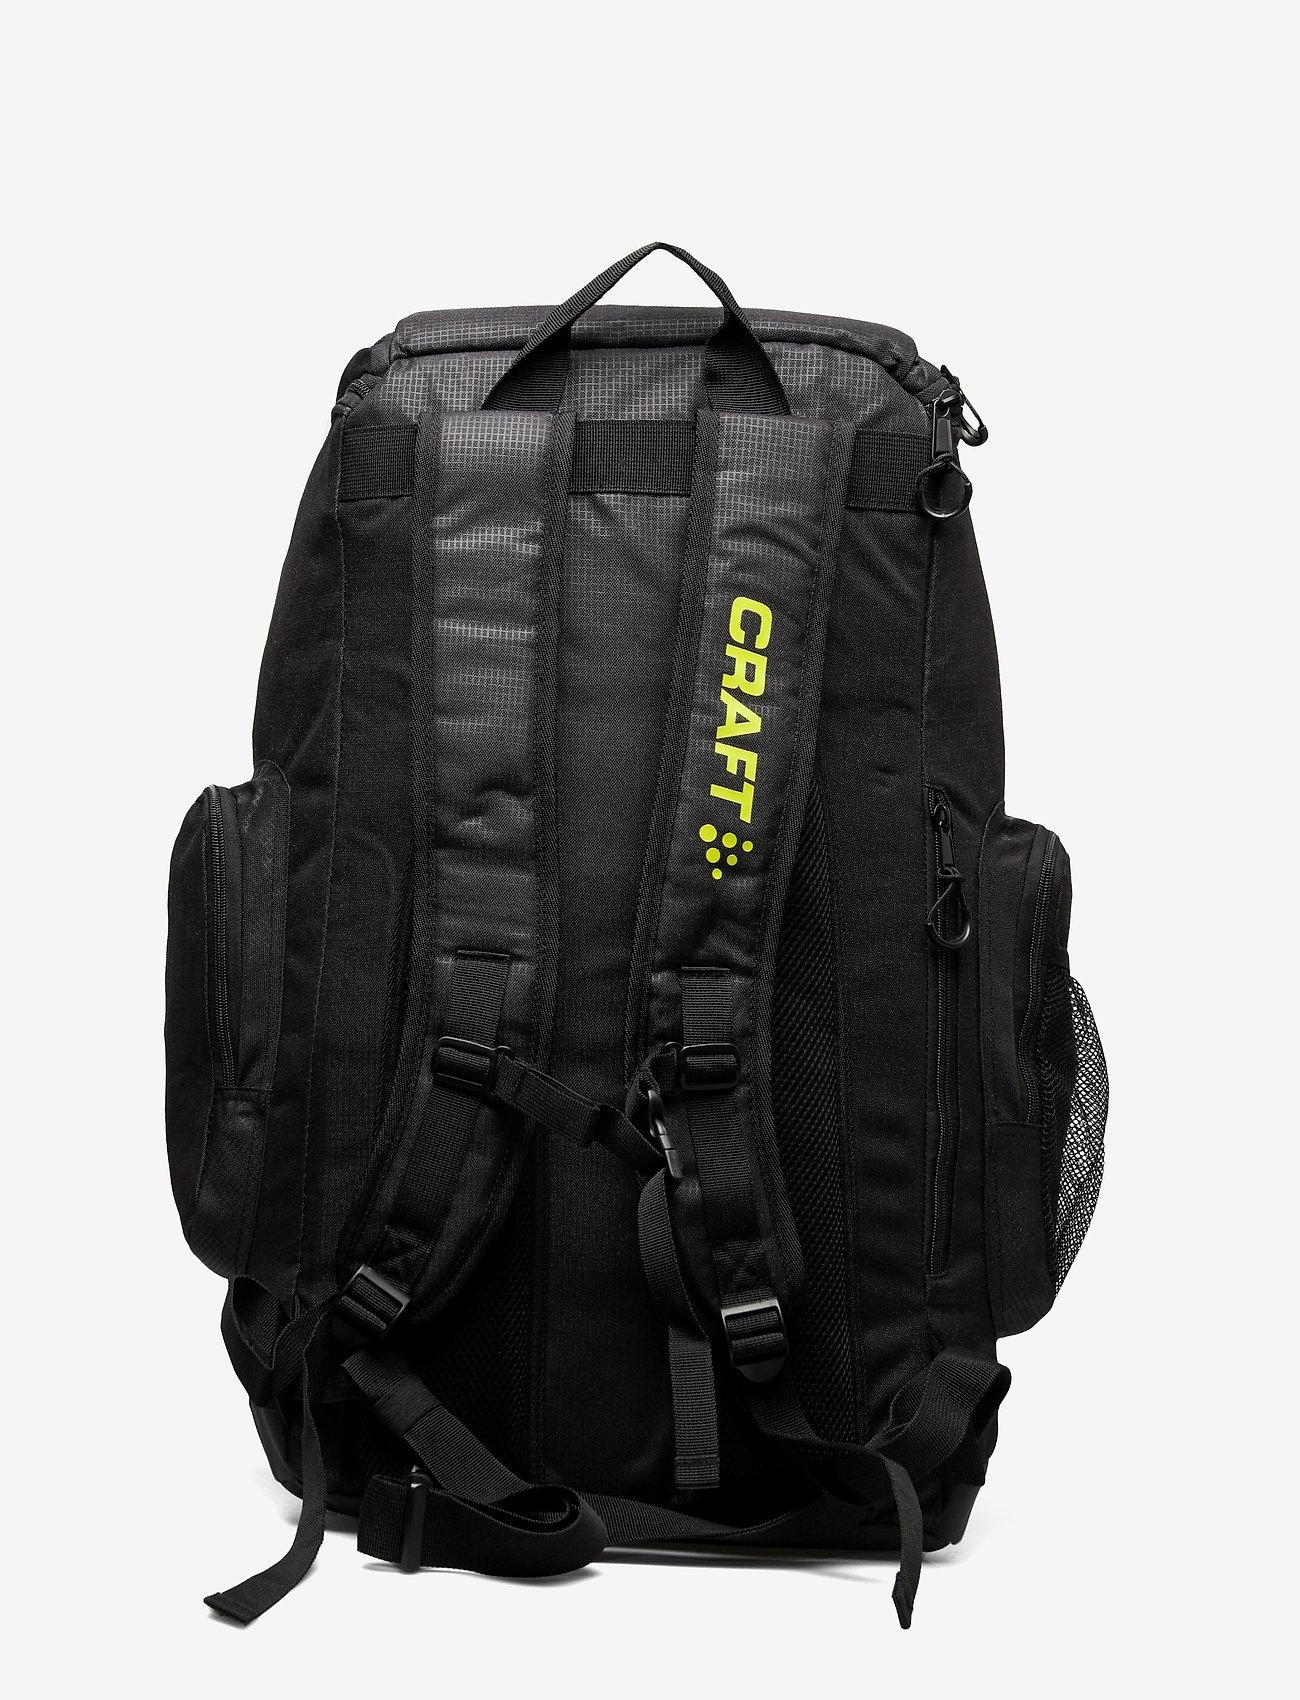 Craft - TRANSIT EQUIPMENT BAG 65 L - racketsporttassen - black - 1